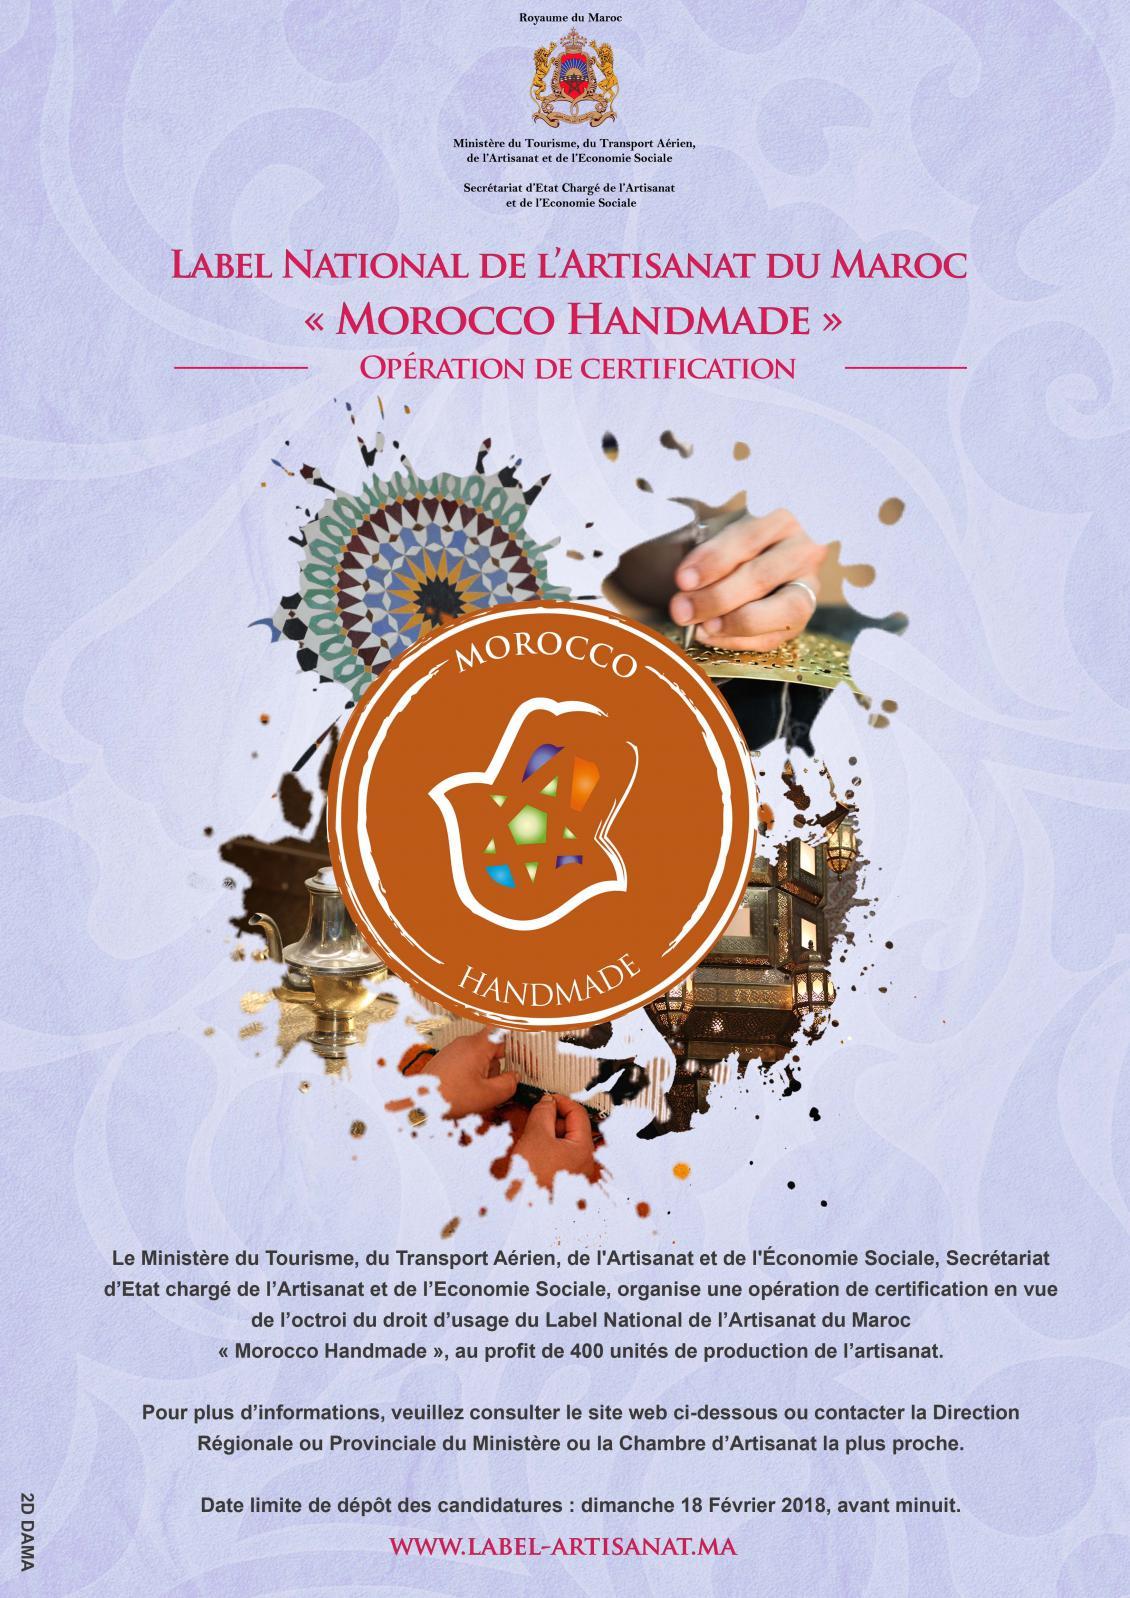 LABEL NATIONAL DE L'ARTISANAT DU MAROC « MOROCCO HANDMADE » | Office ...